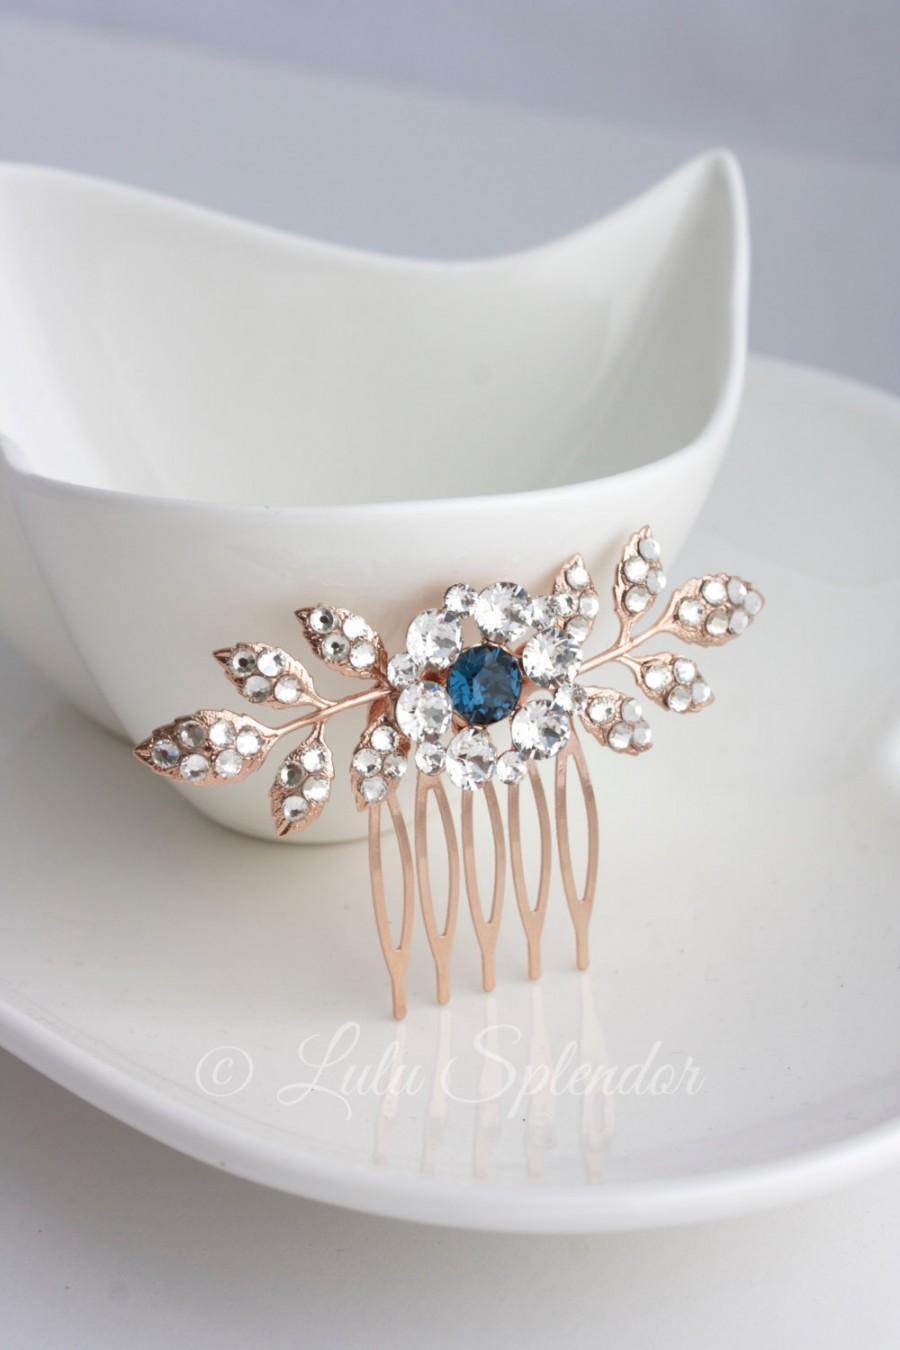 Hochzeit - Rose Gold Wedding Comb Sapphire Montana Blue Bridal Hair Accessories Leaf Bridal Hair Pin Small Bridal Clip Blue Crystal Hair Comb MACY